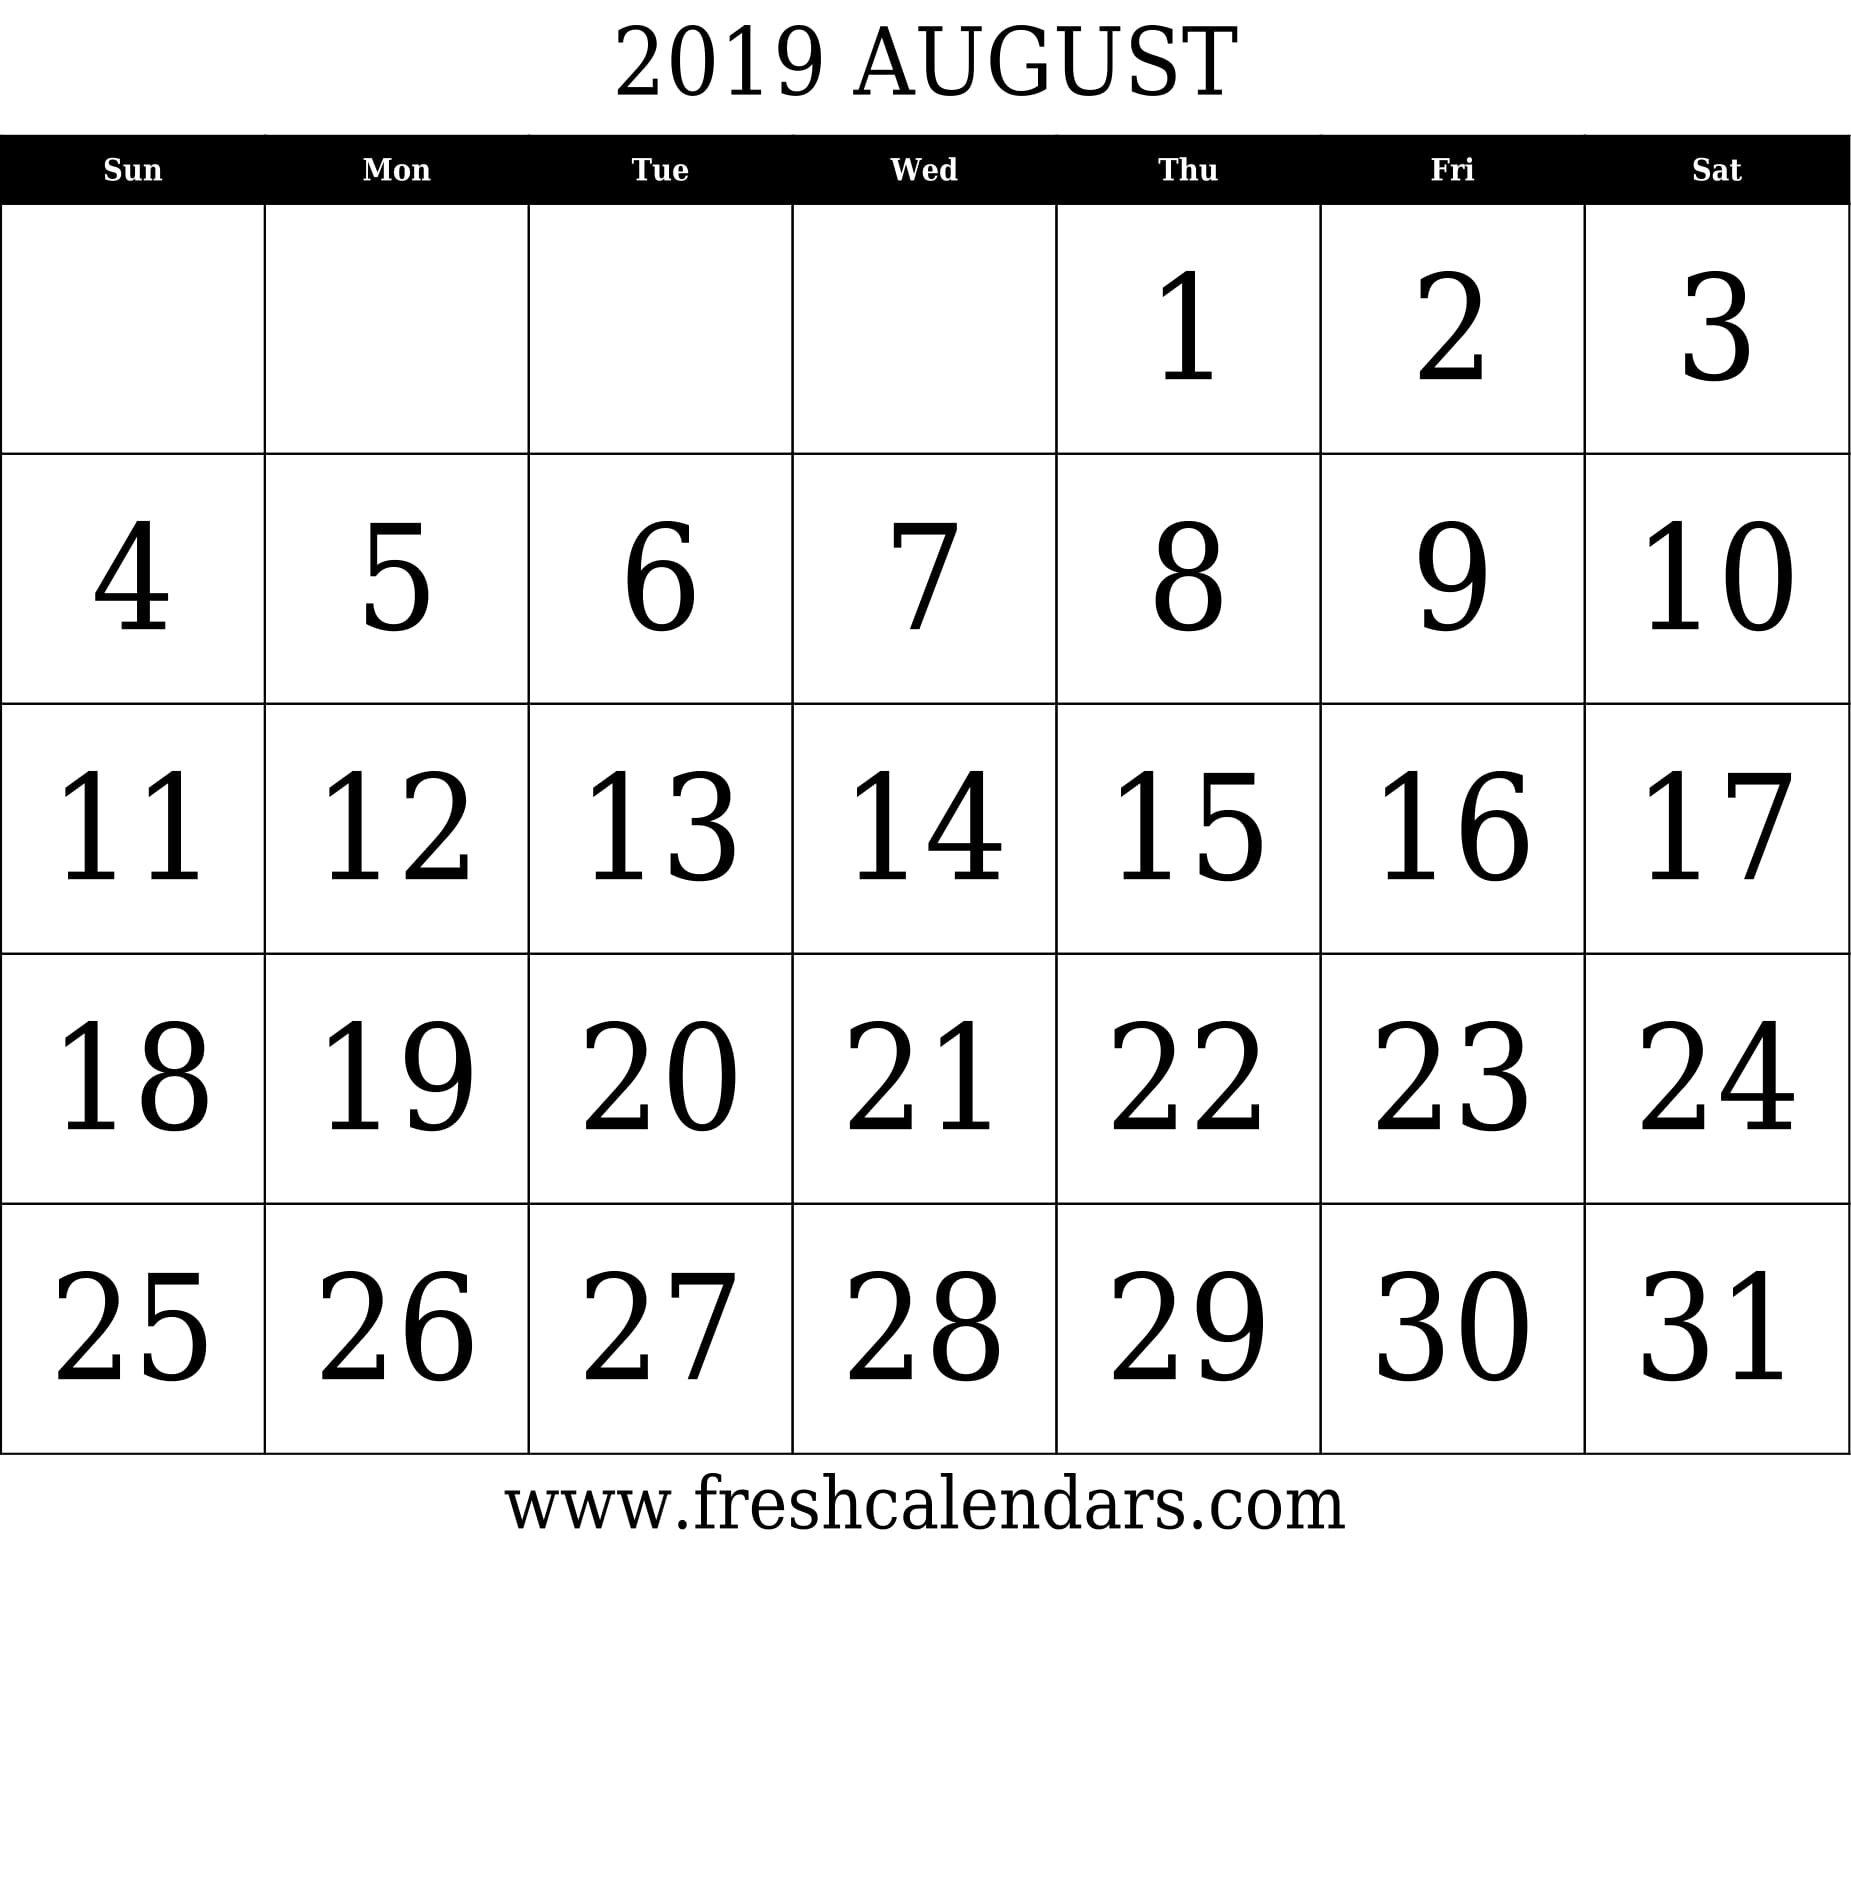 August 2019 Calendar Printable – Fresh Calendars August 3 2019 Calendar